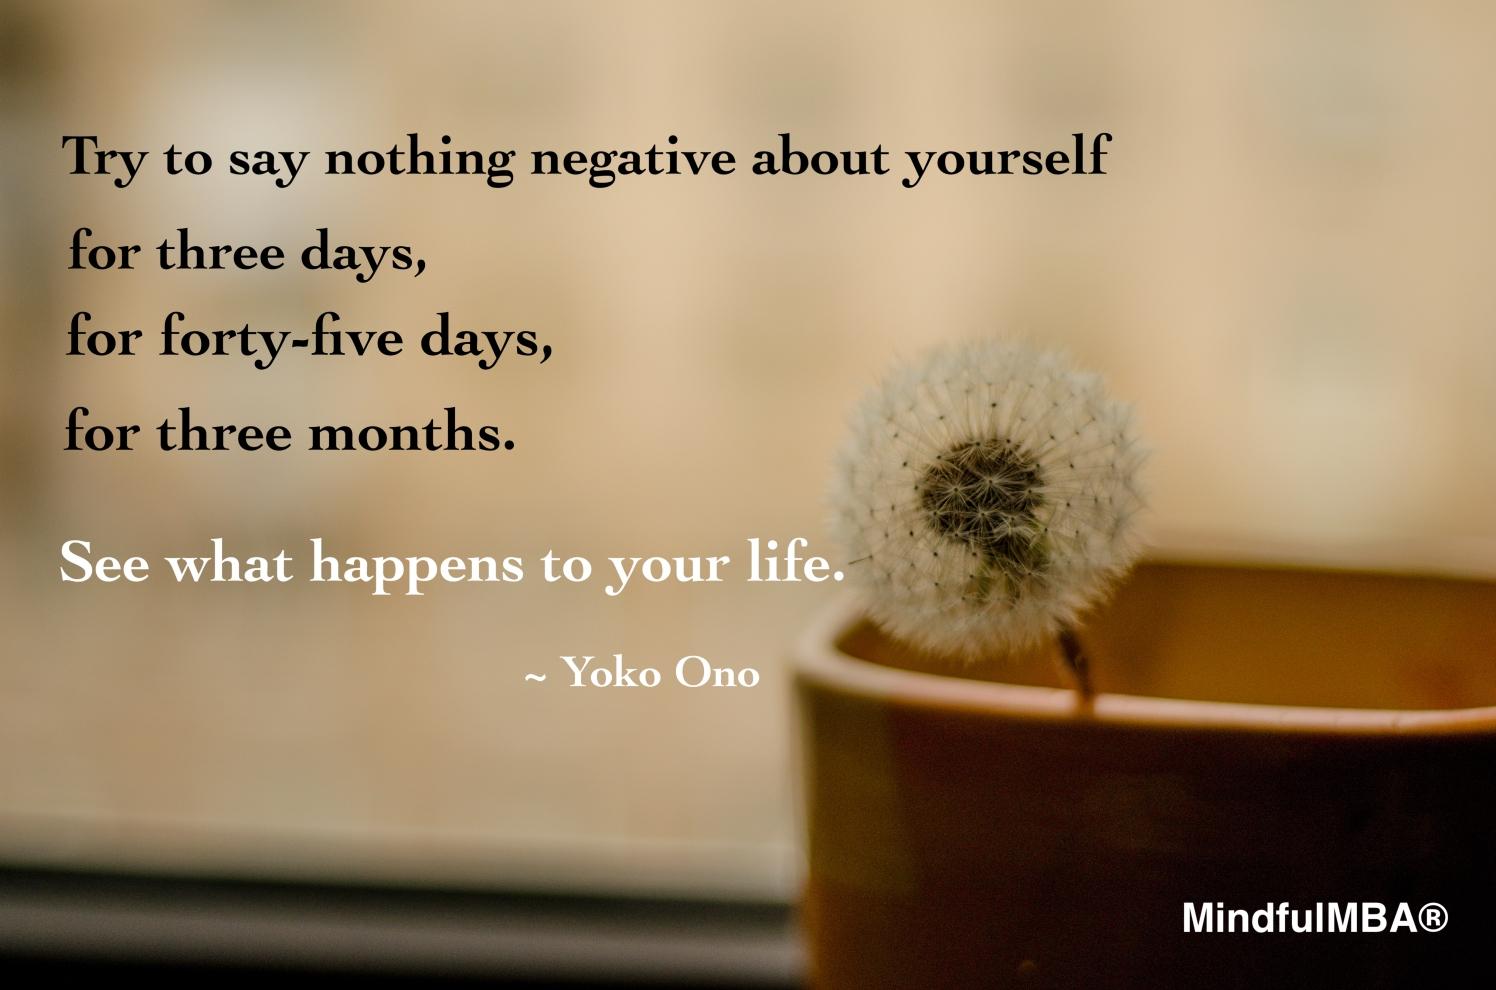 Yoko Ono_Nothing negative quote w tag.jpg